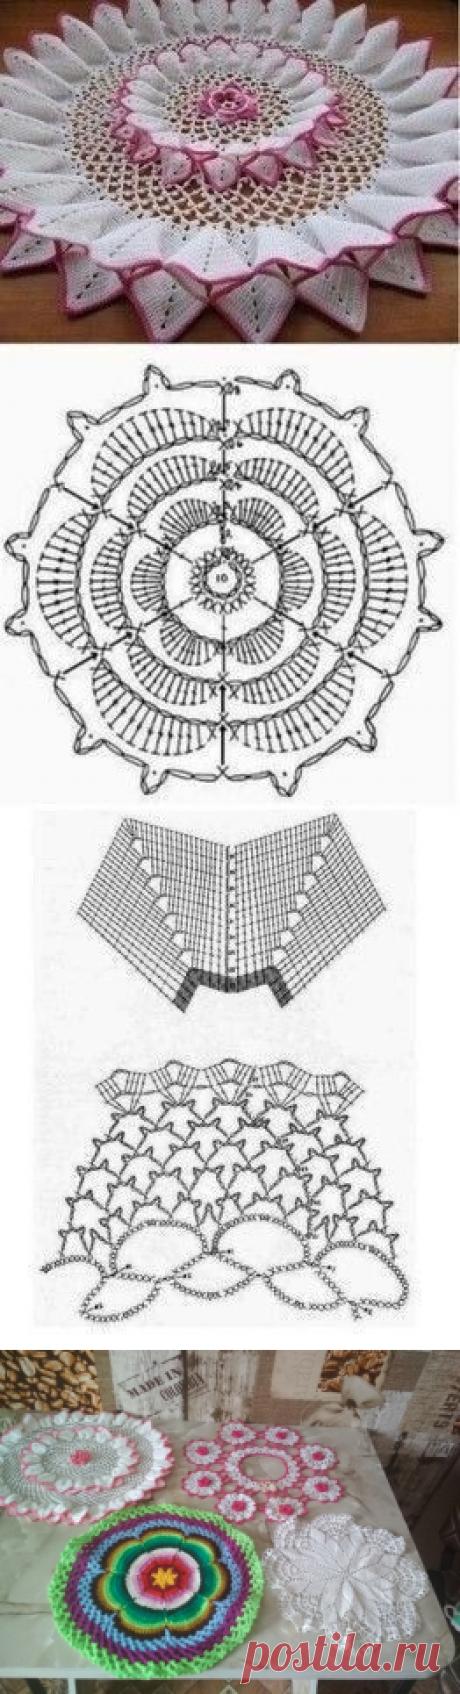 Объемная салфетка крючком